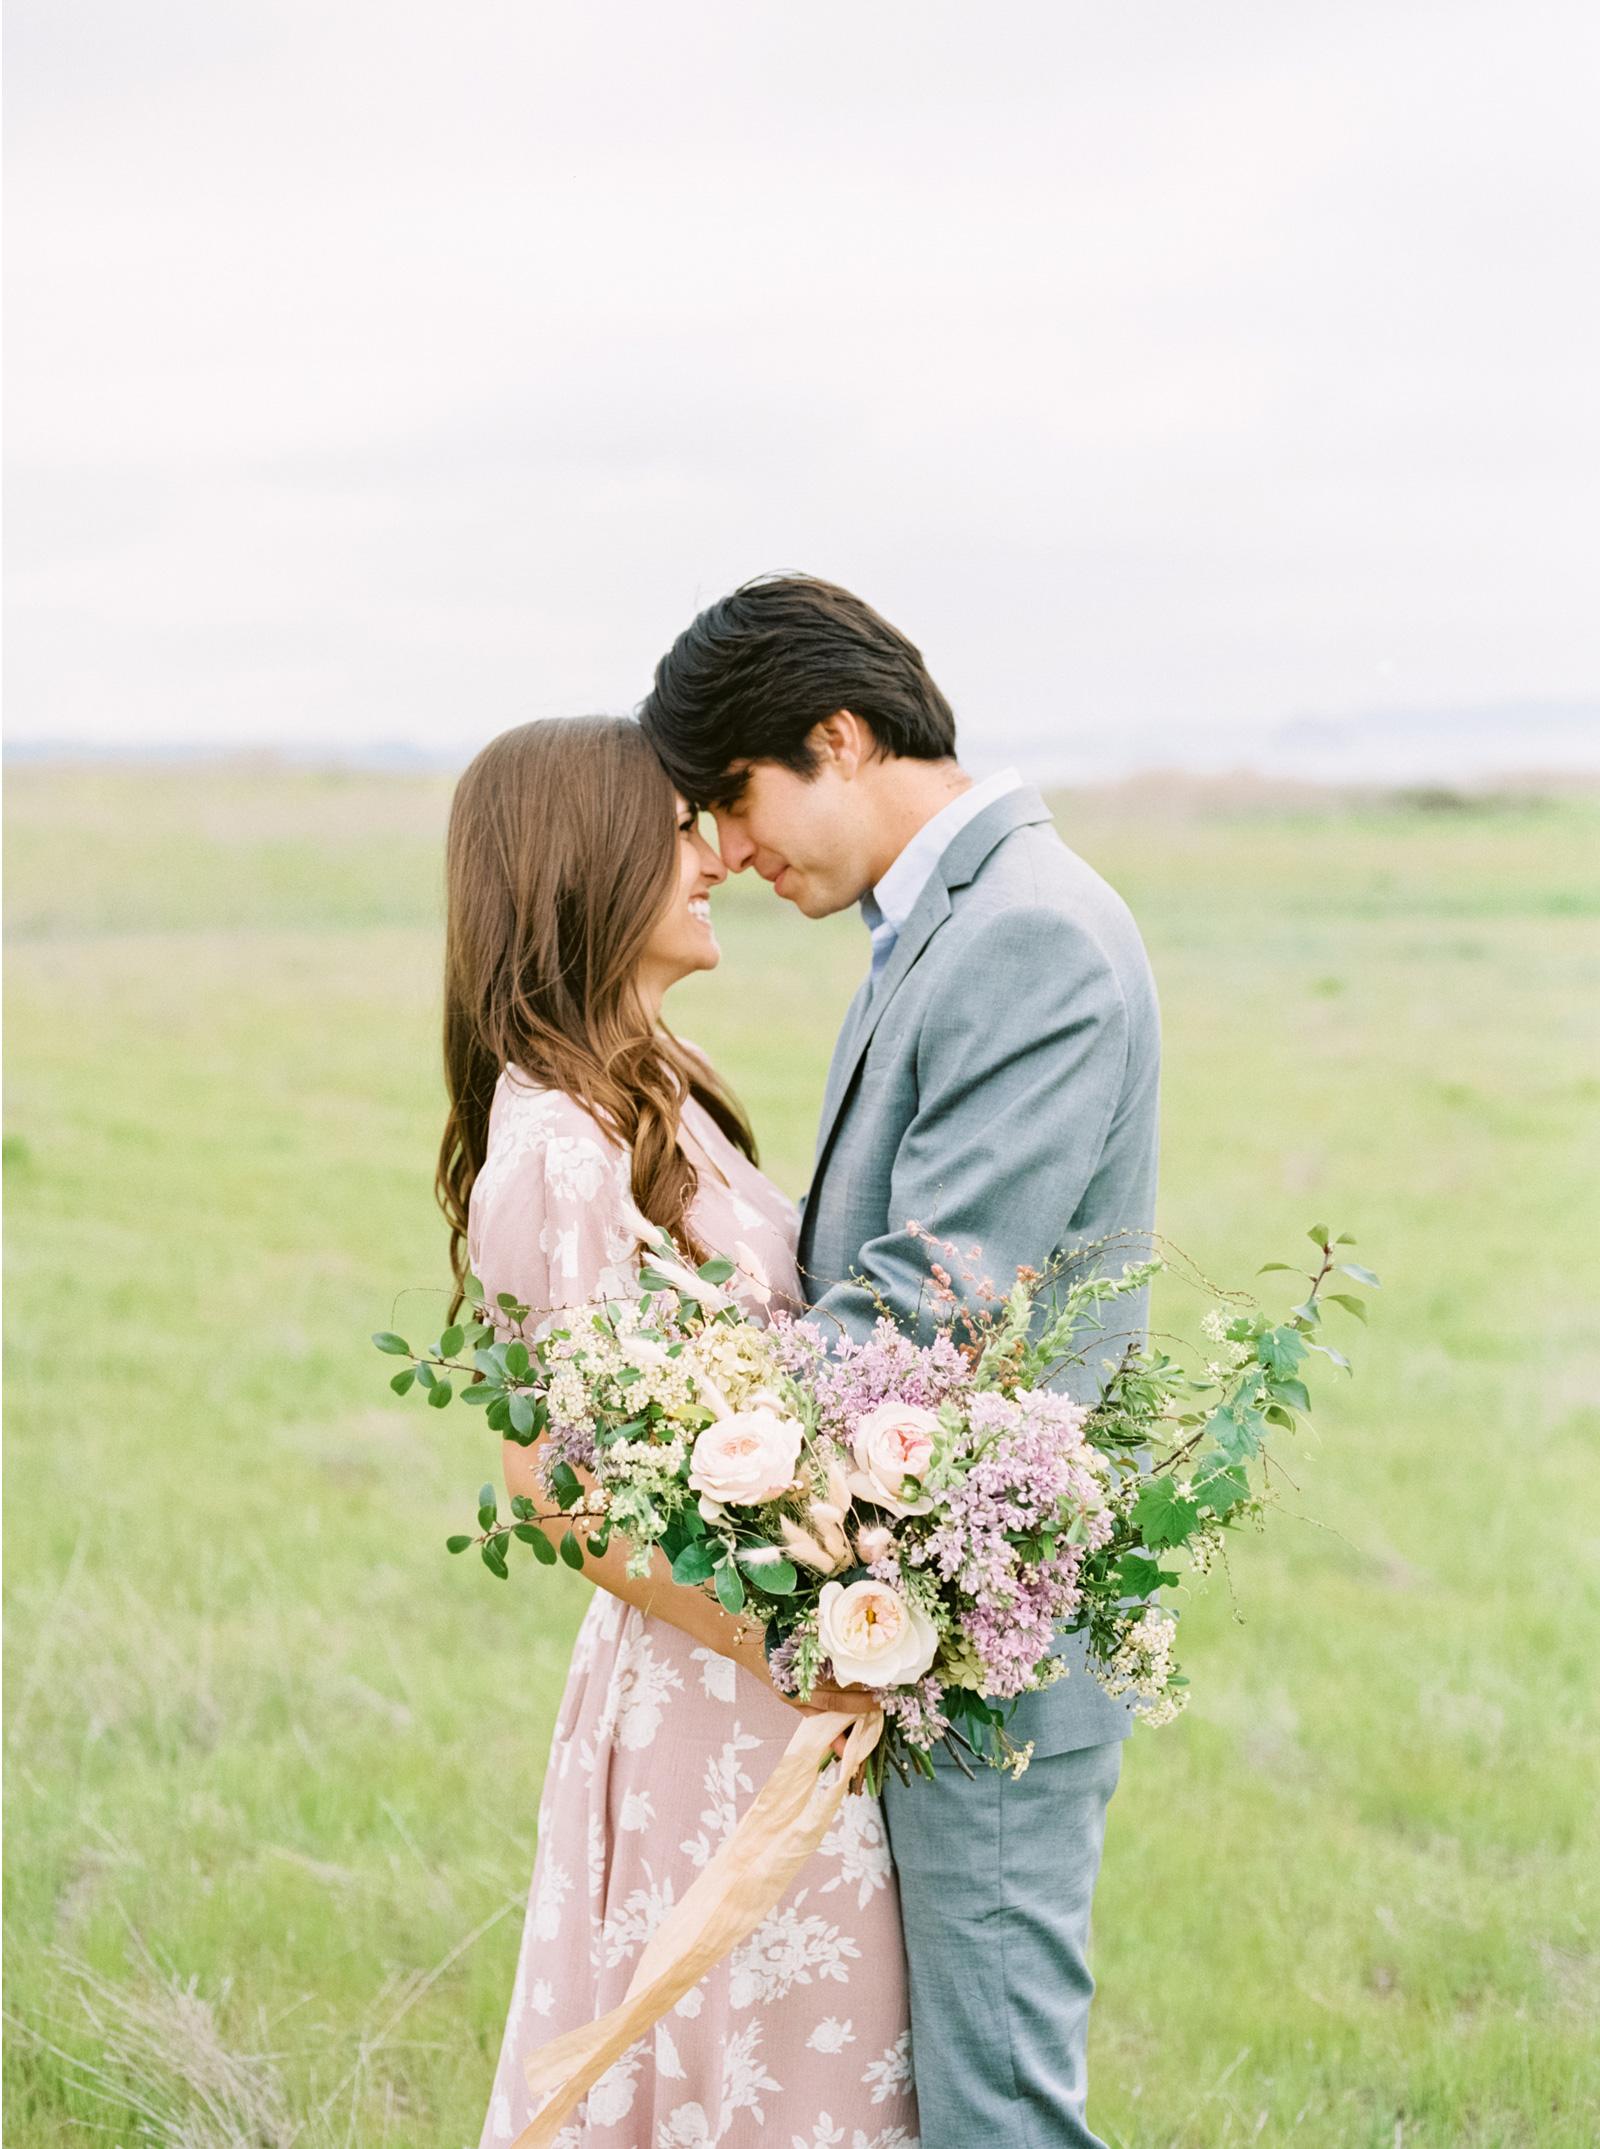 Saddlerock-Ranch-Malibu-Wedding-Natalie-Schutt-Photography-Romantic-Florals-Rolling-Hills-Engagement_15.jpg